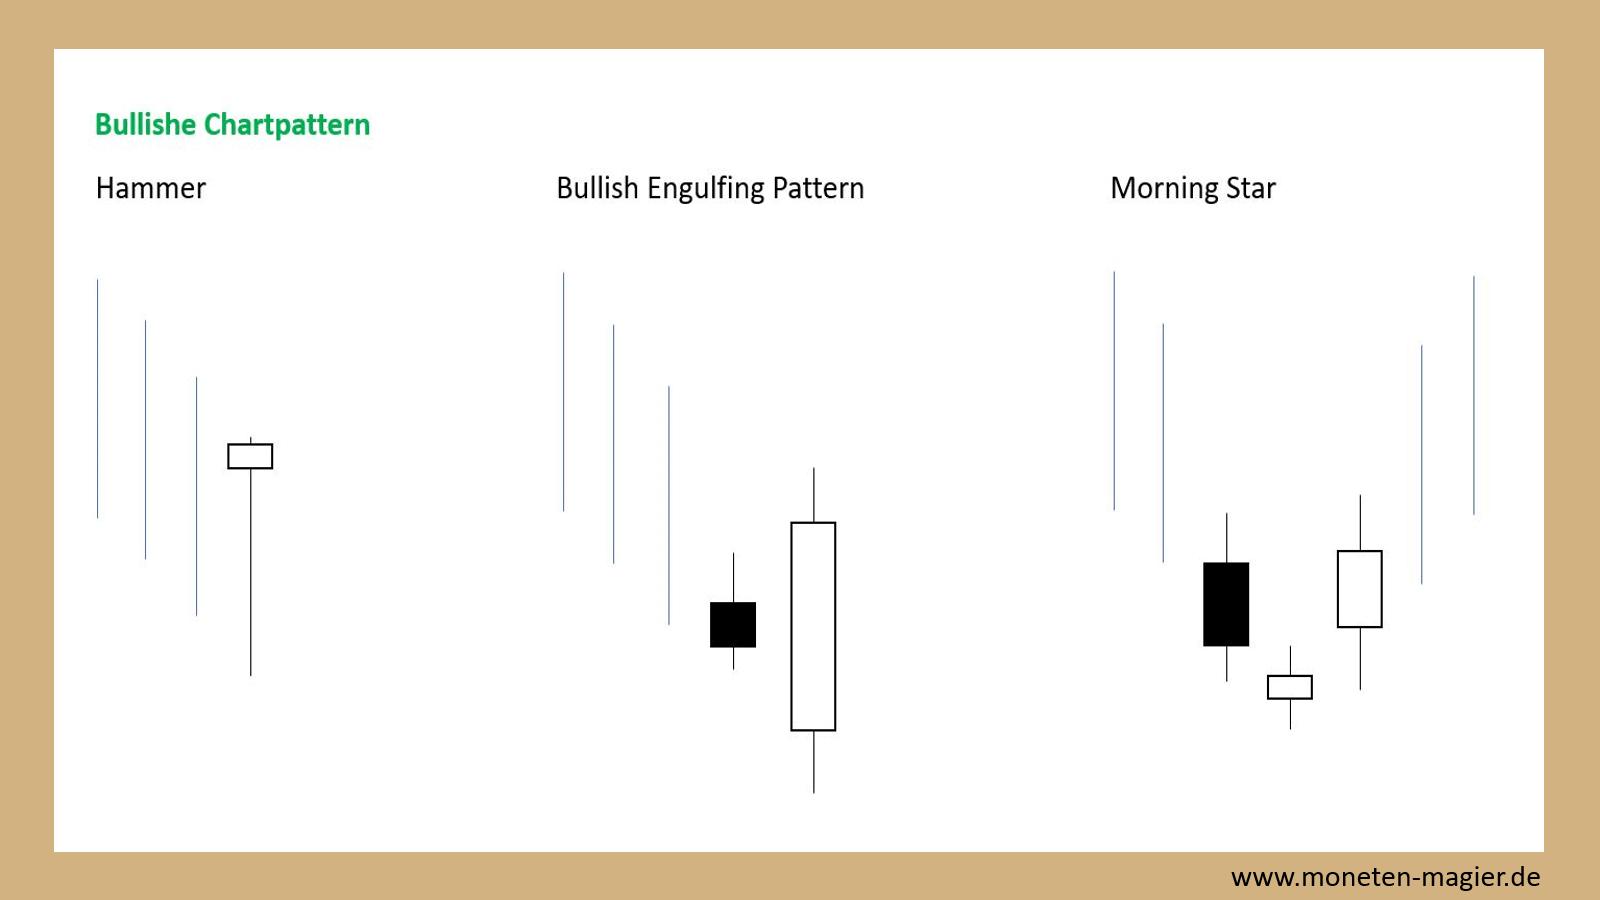 candlesticks chart pattern moneten magier bullishe chartpattern